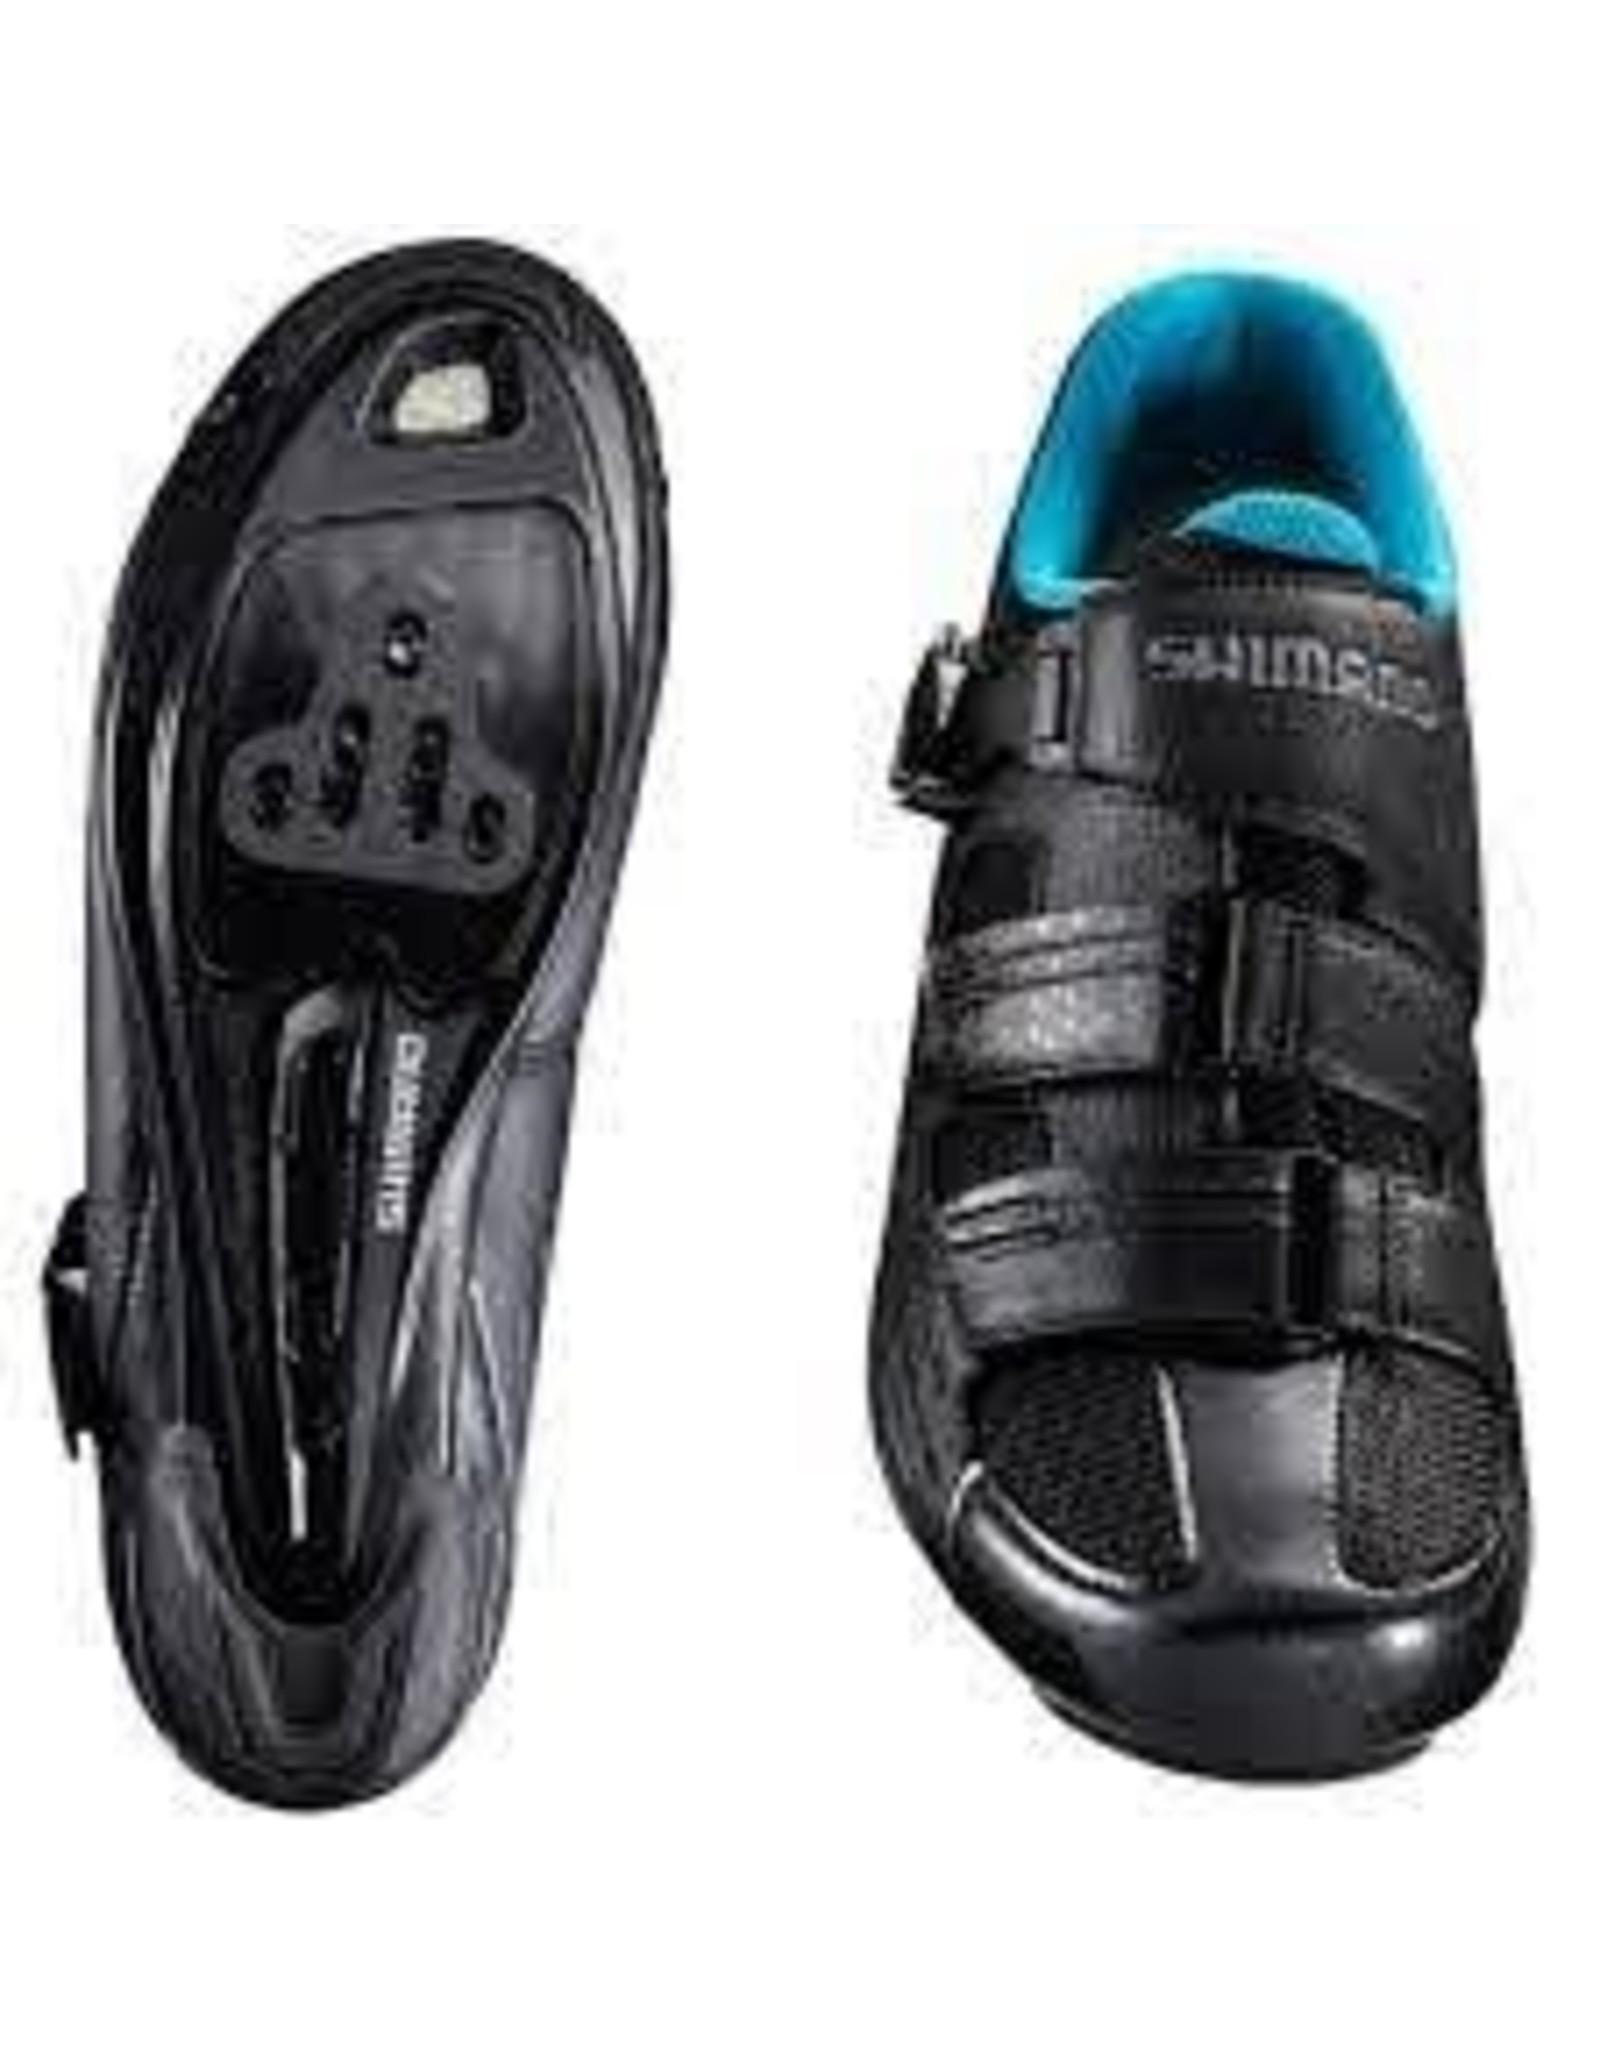 SH-RP3W Bicycle Shoes BLACK 39